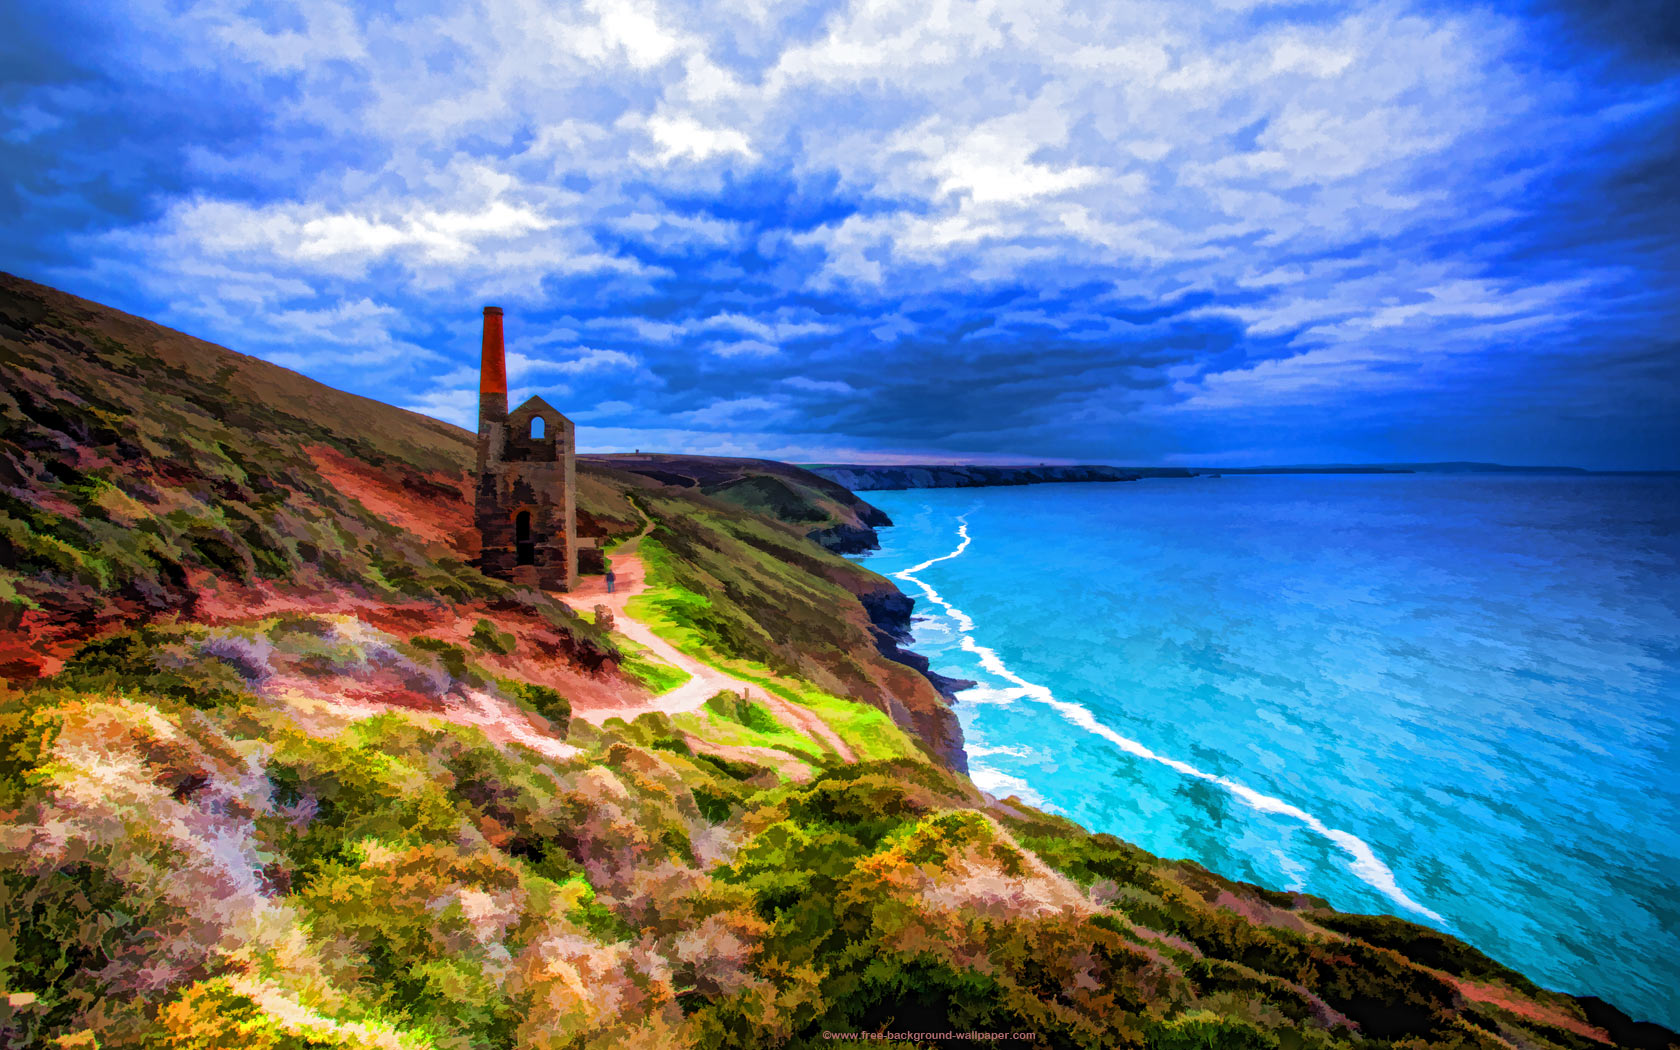 Tin Mine in Cornwall Artistic Backgrounds   1680x1050 pixels 1680x1050